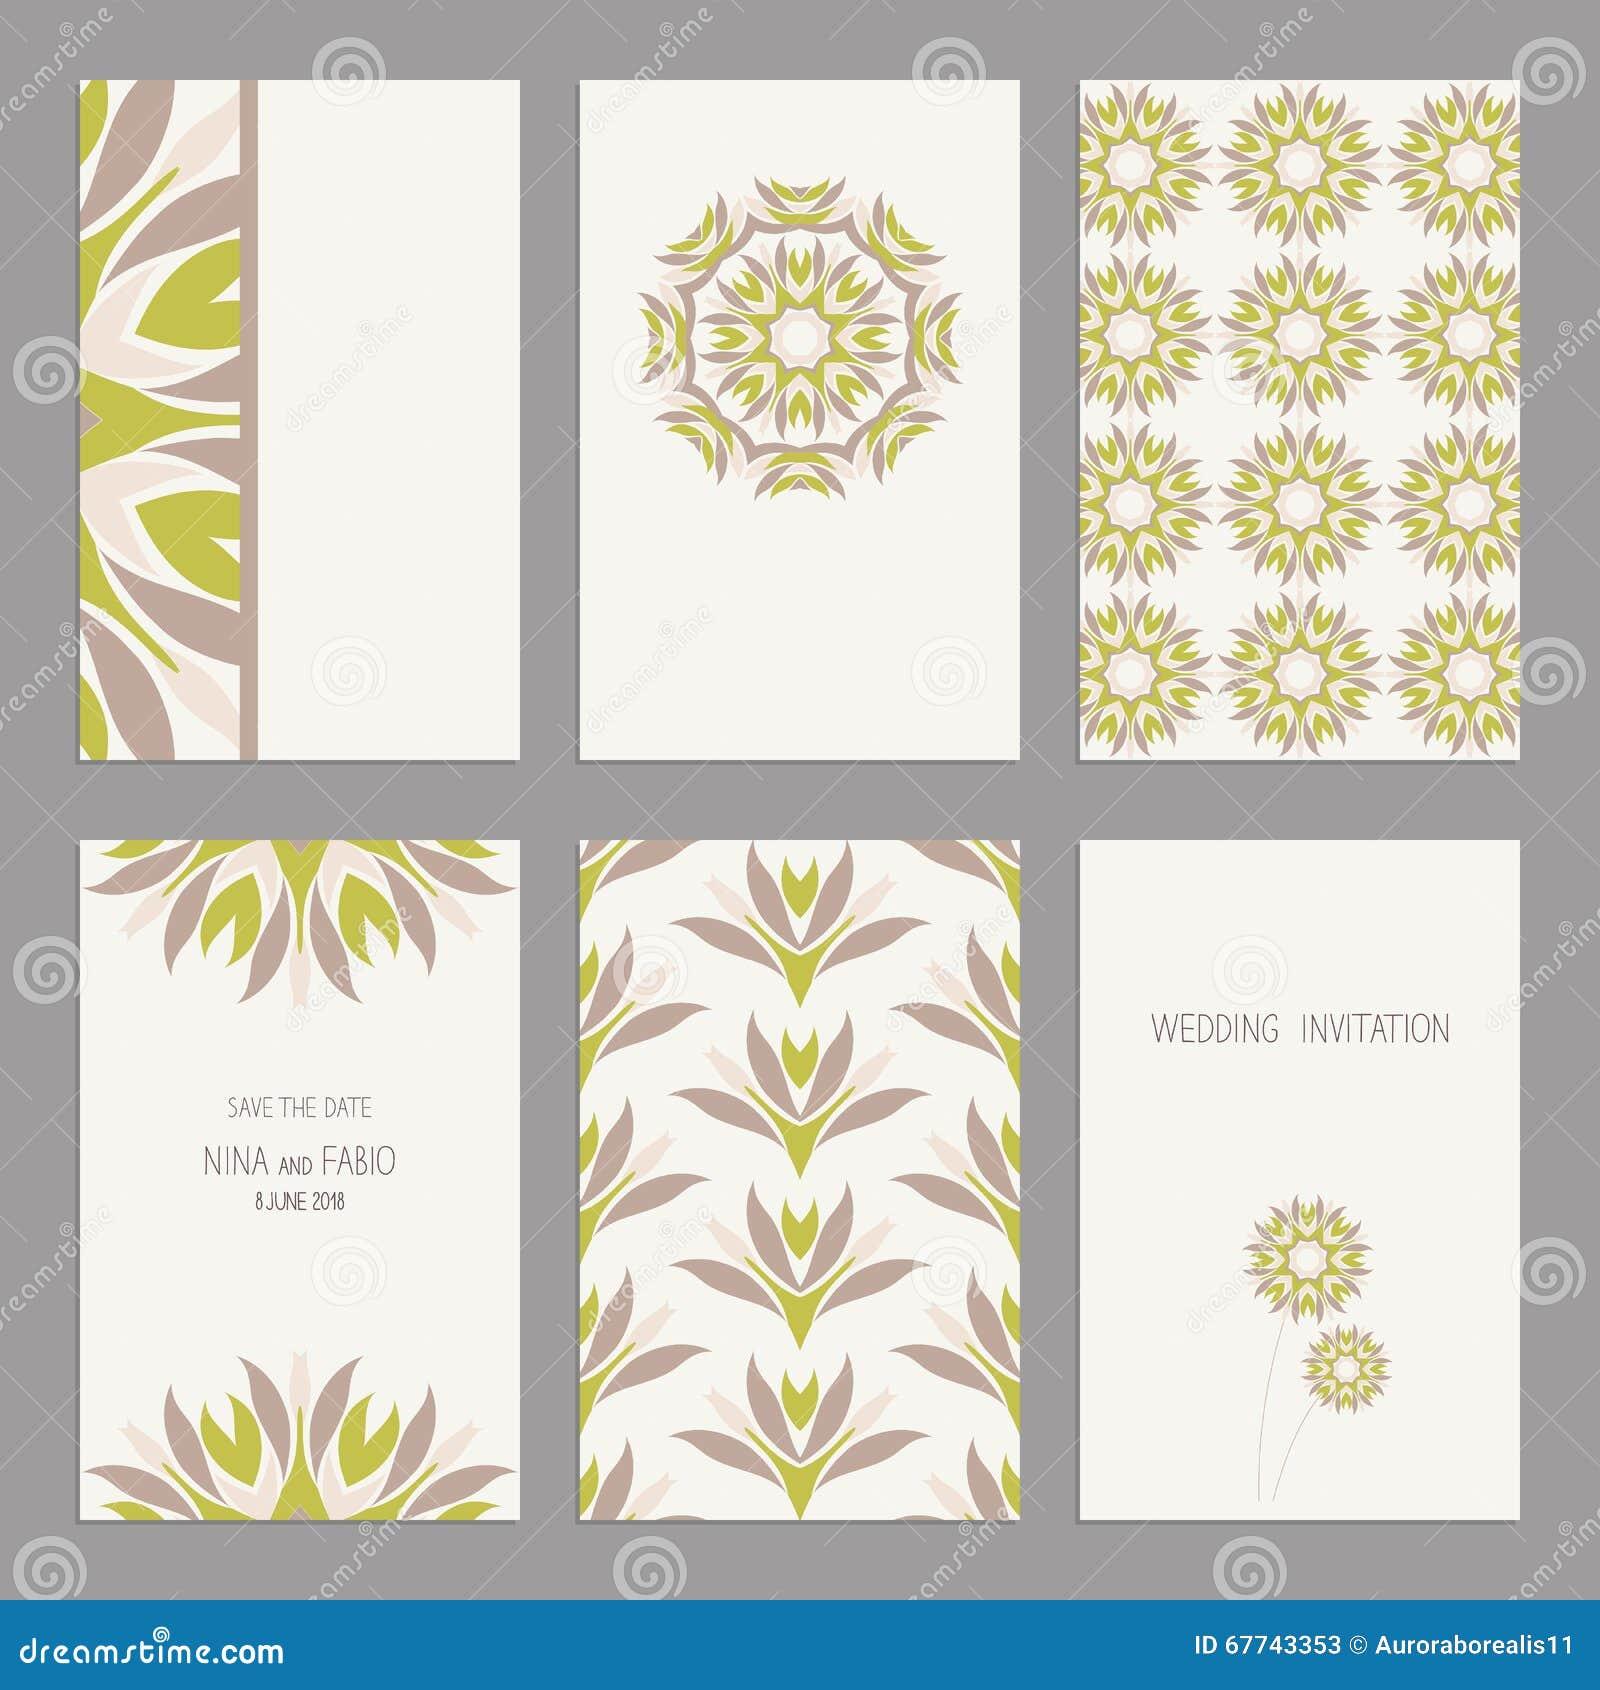 Set Of Vintage Cards Templates Editable: Wedding Card Templates Editable At Websimilar.org